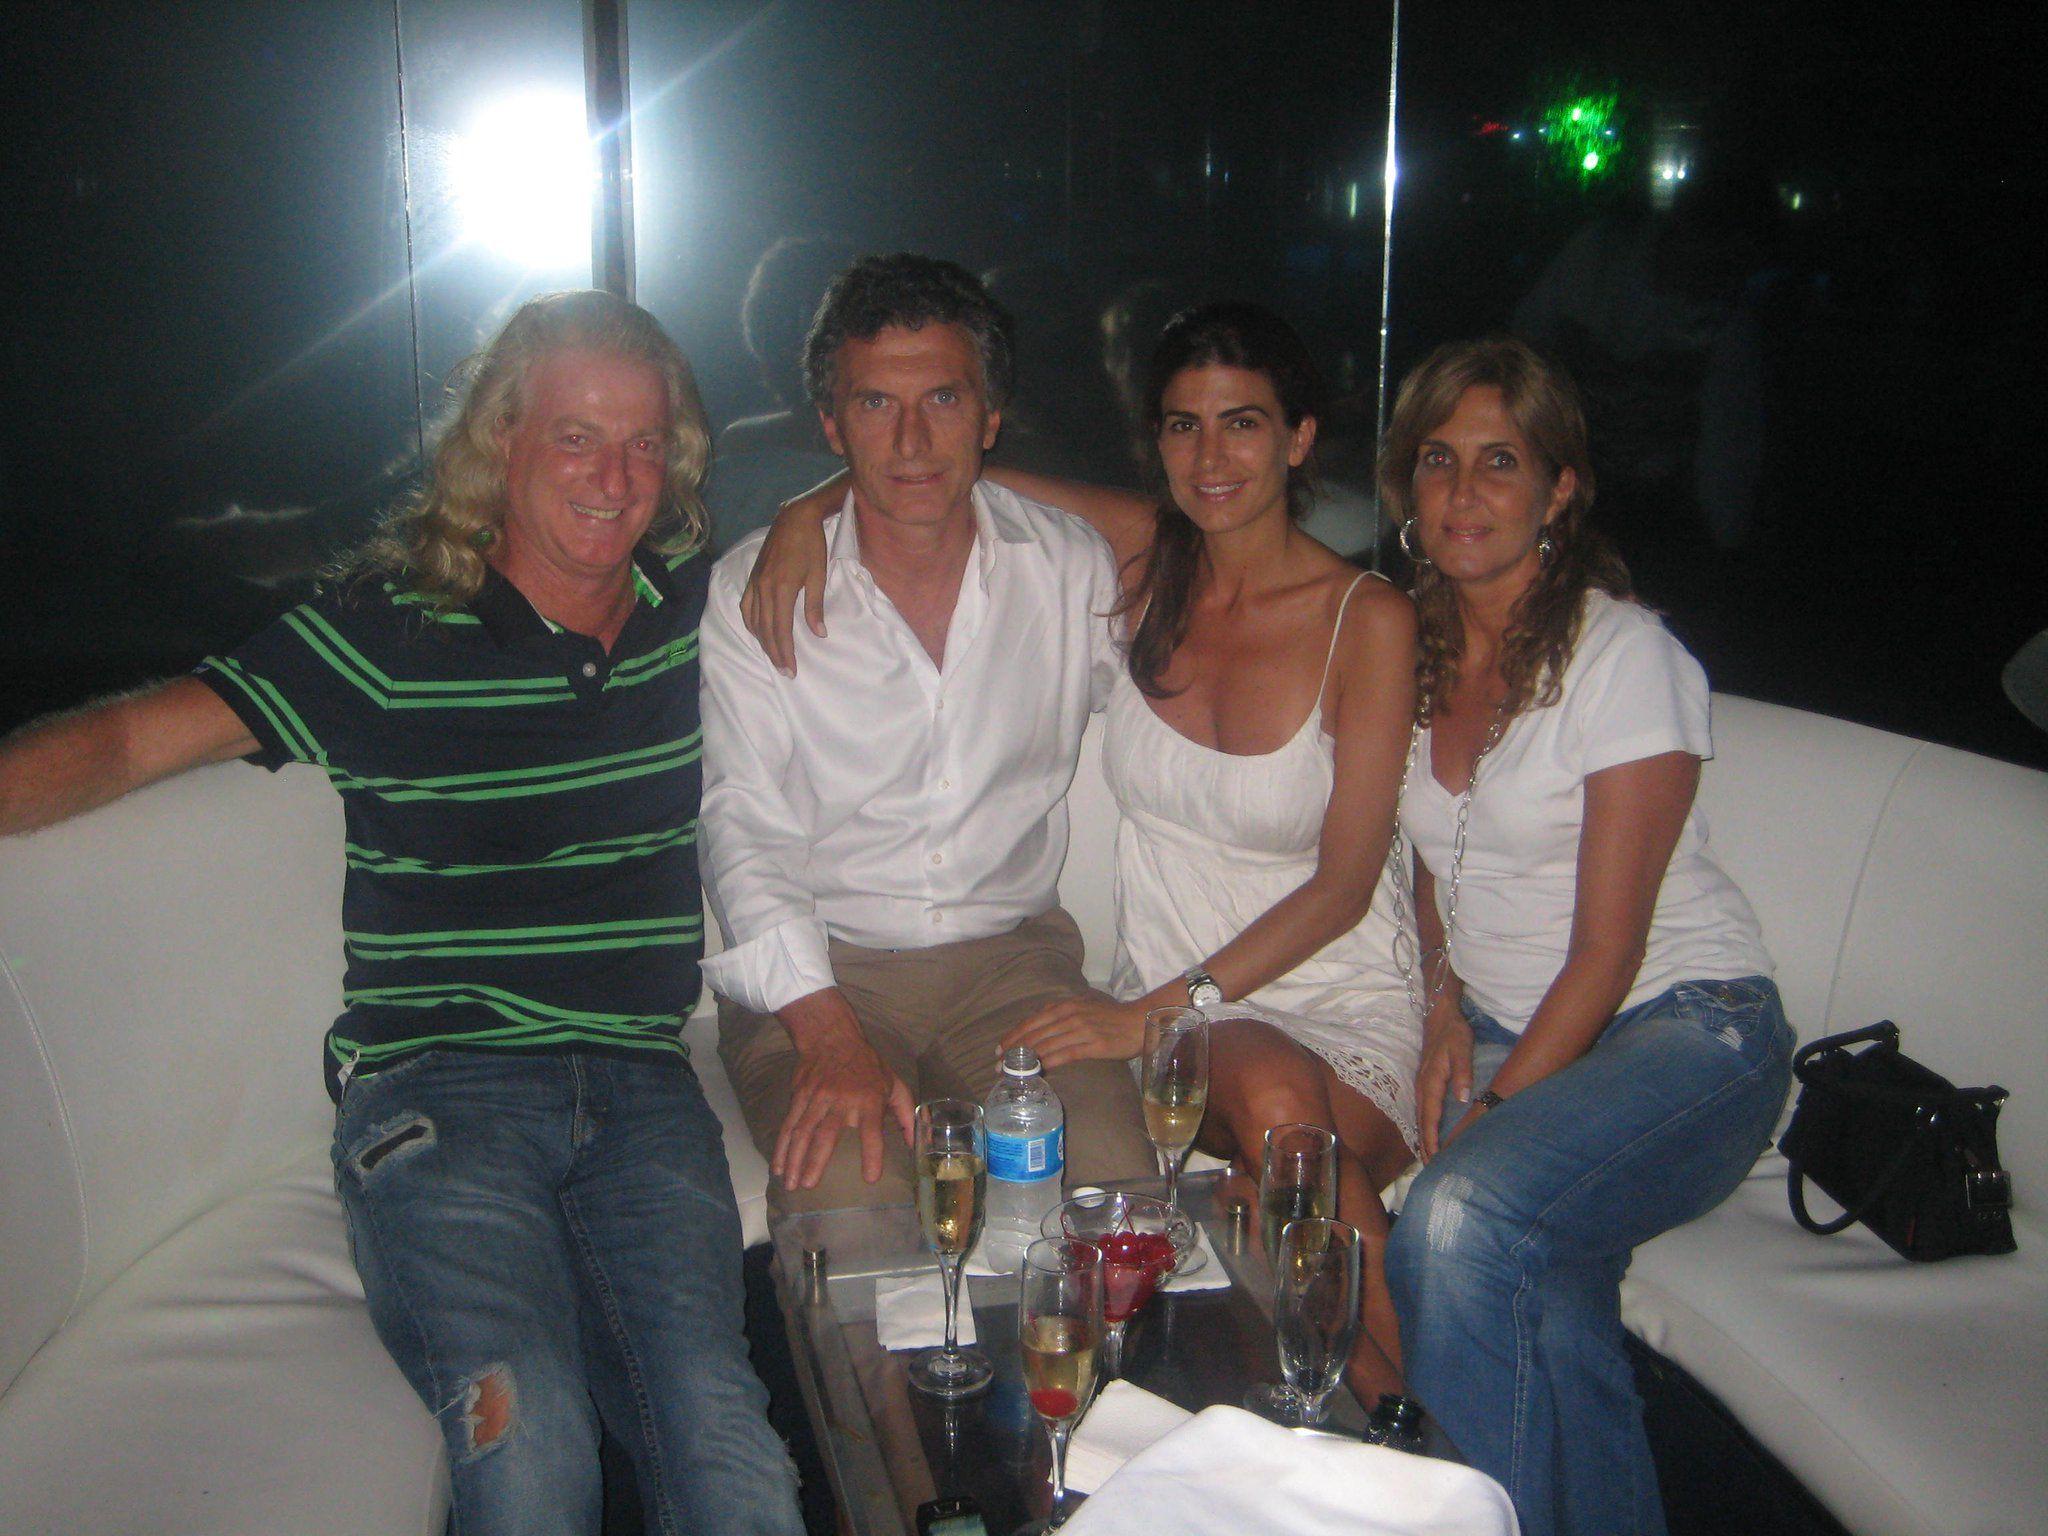 MauricioMacri-RaulMartins-Conde-Prostibulos-Tratadepersonas